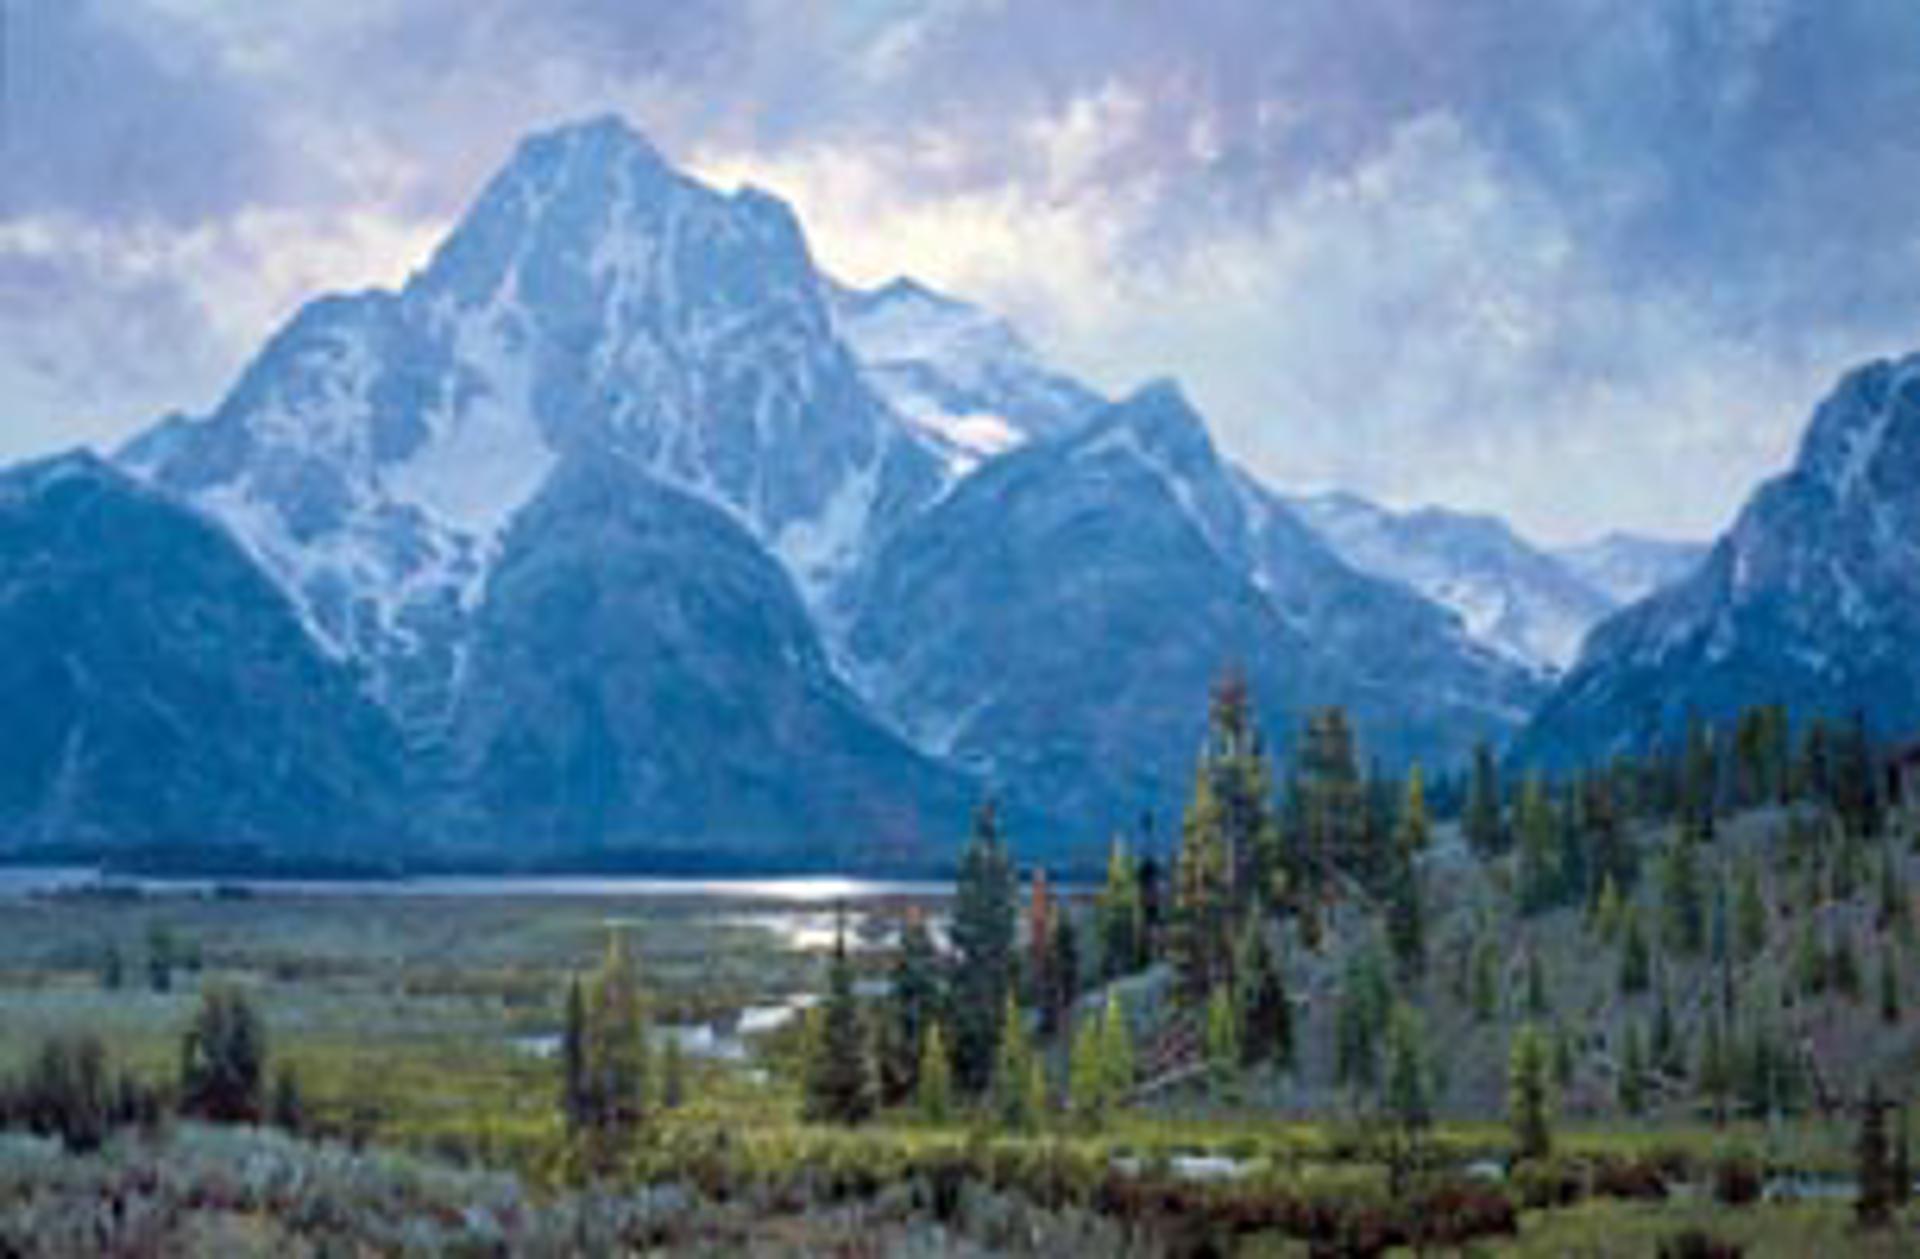 Glacier Borne by Jim Wilcox